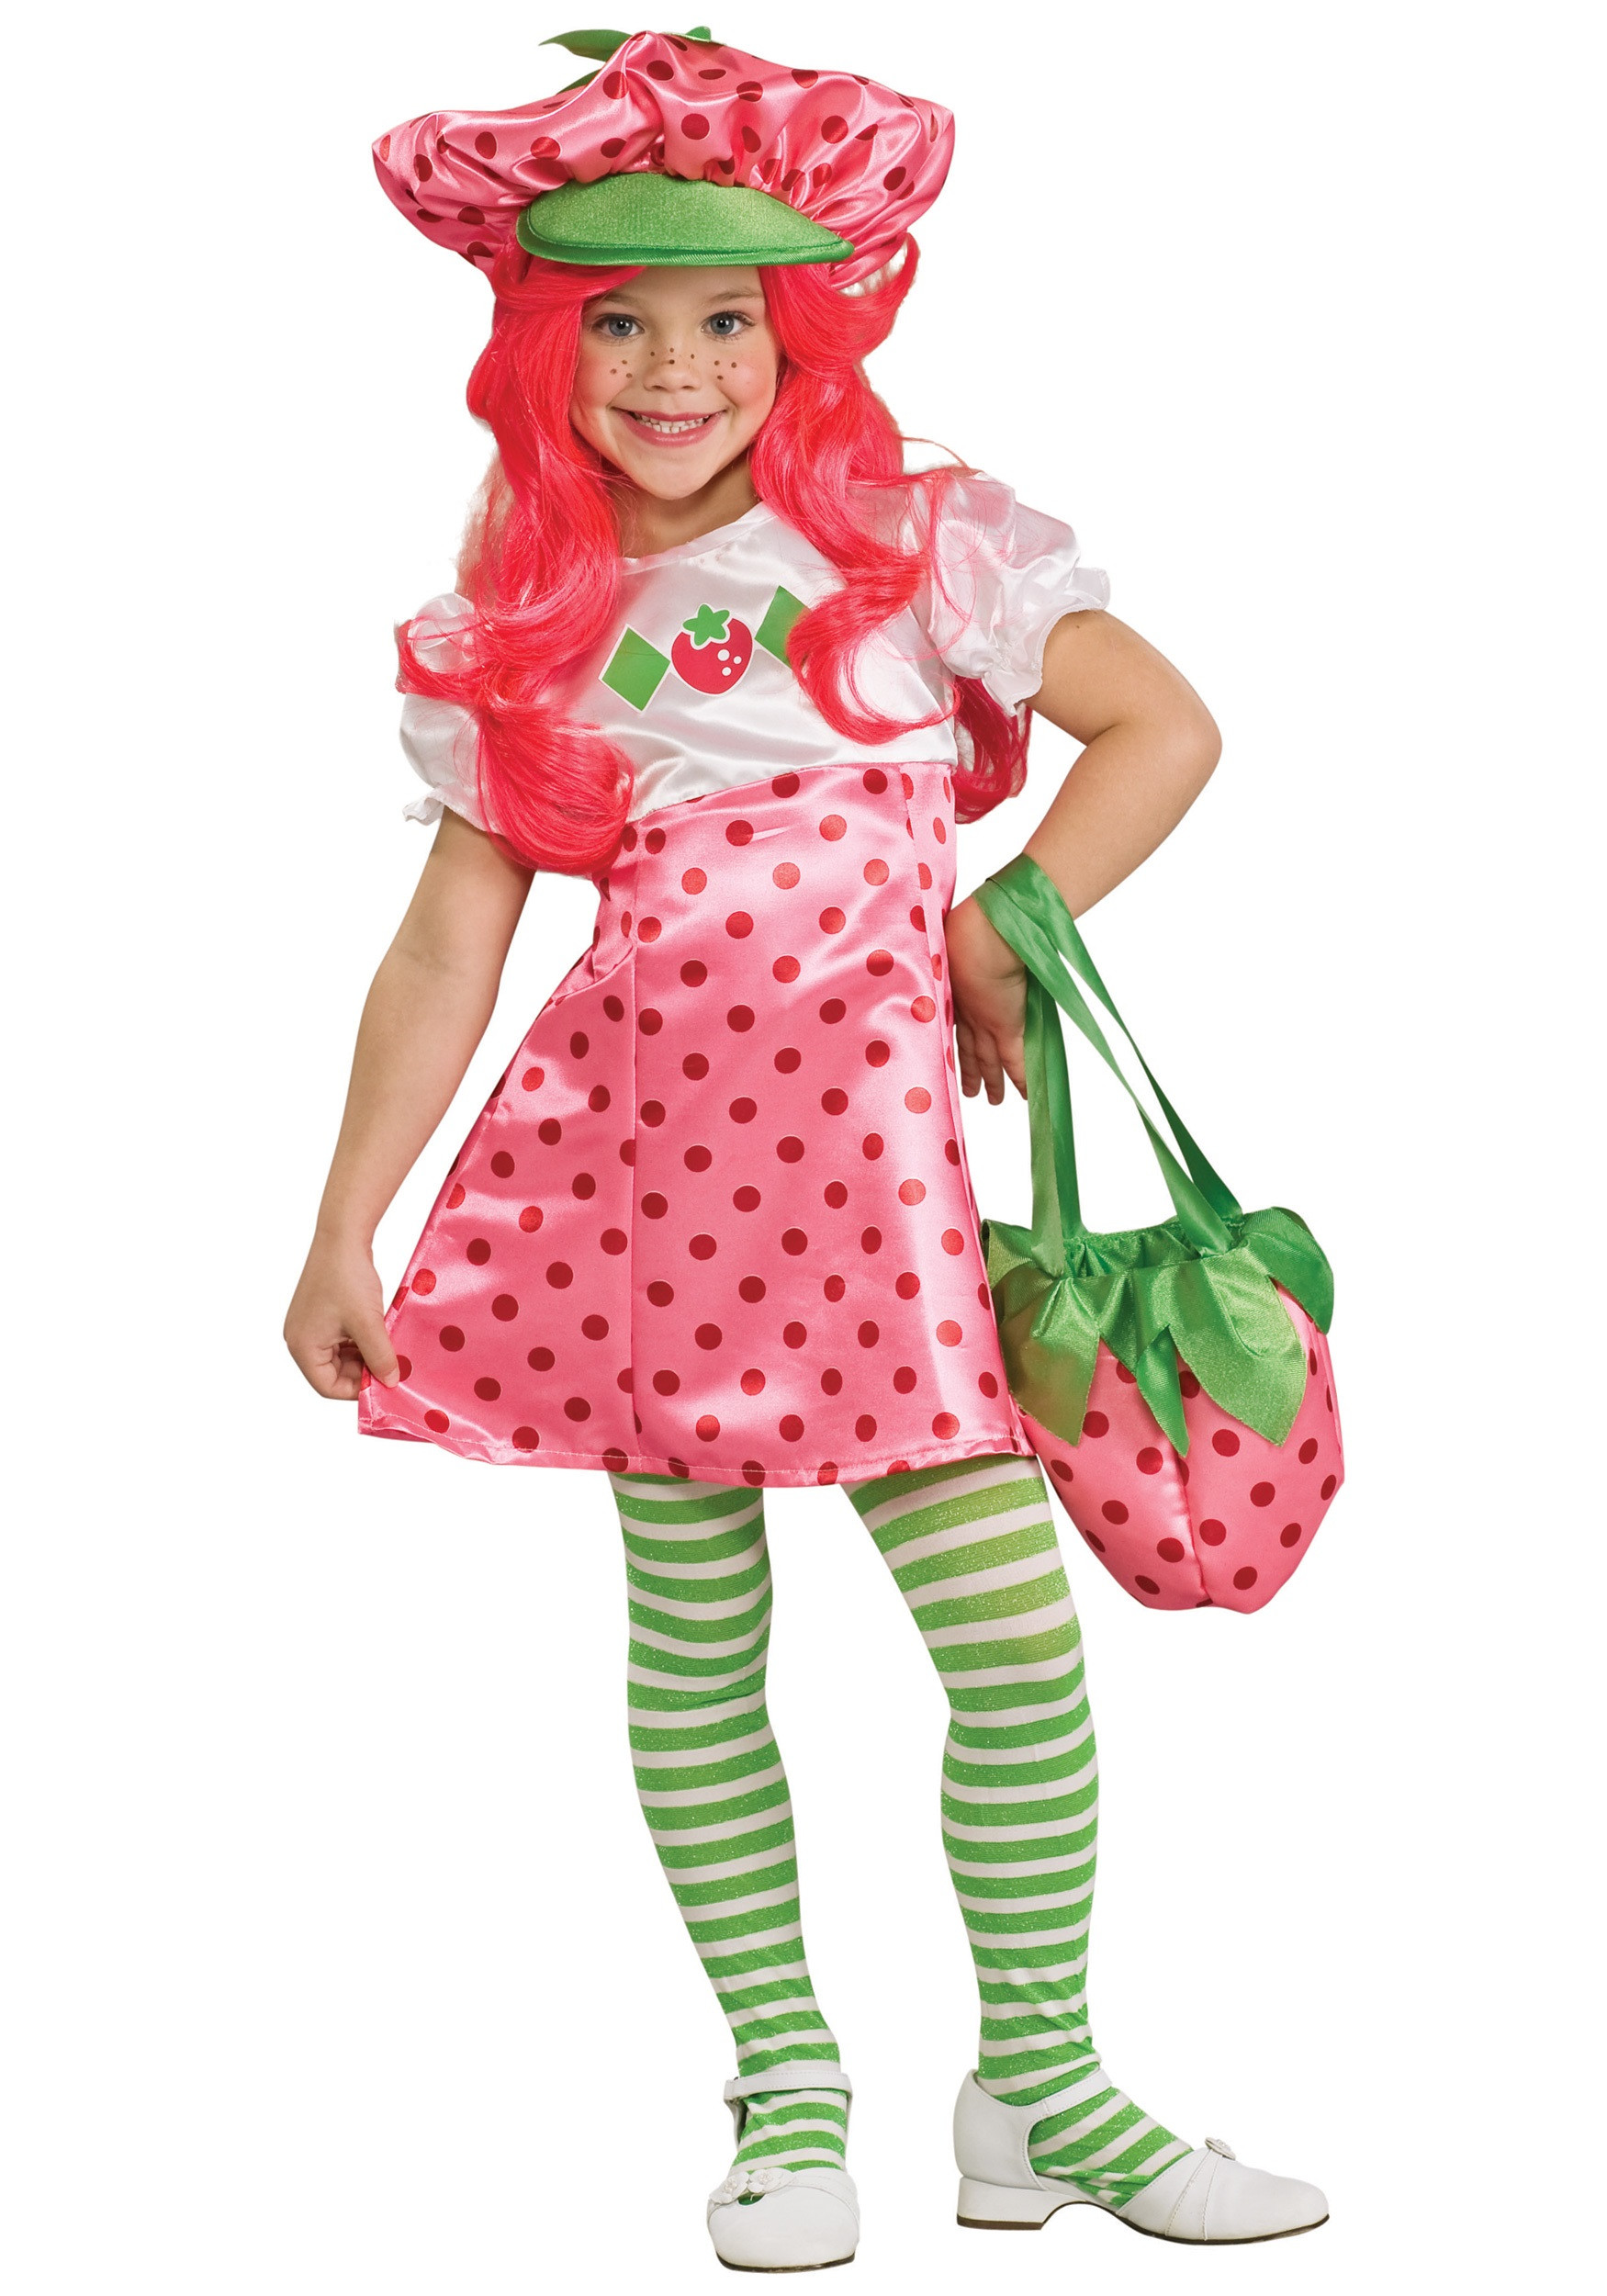 Strawberry Short Cake Halloween  Child Strawberry Shortcake Costume